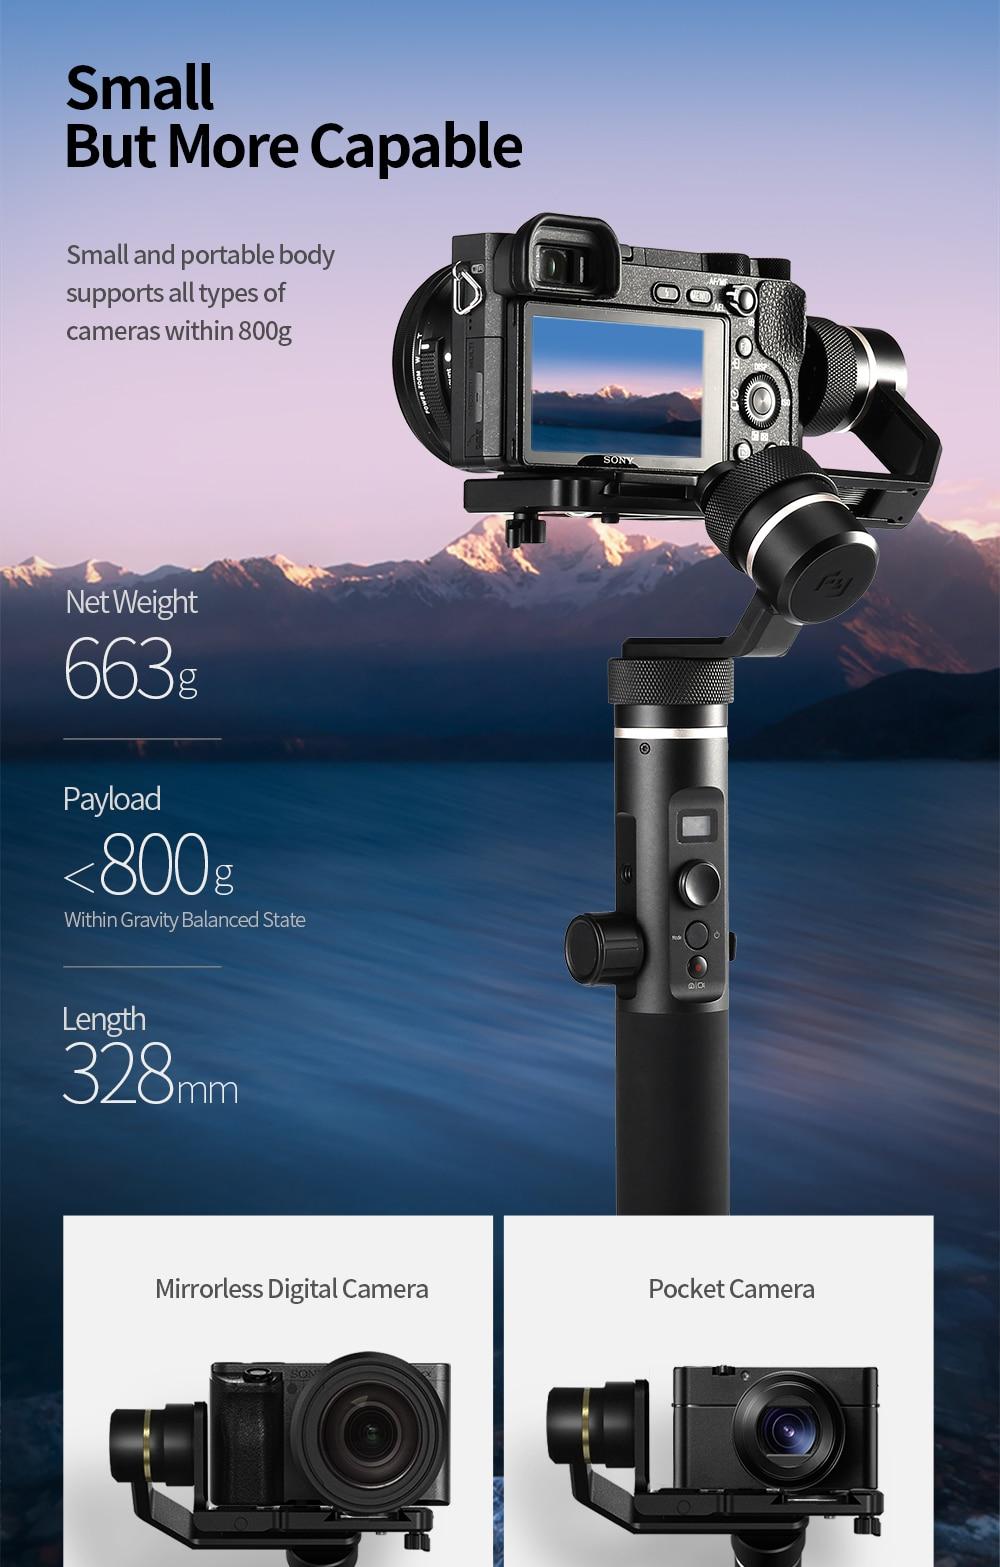 FeiyuTech G6 Plus 3-Axis Handheld Gimbal Stabilizer for Mirrorless Camera Pocket Camera GoPro Smartphone Payload 800g Feiyu G6P 2